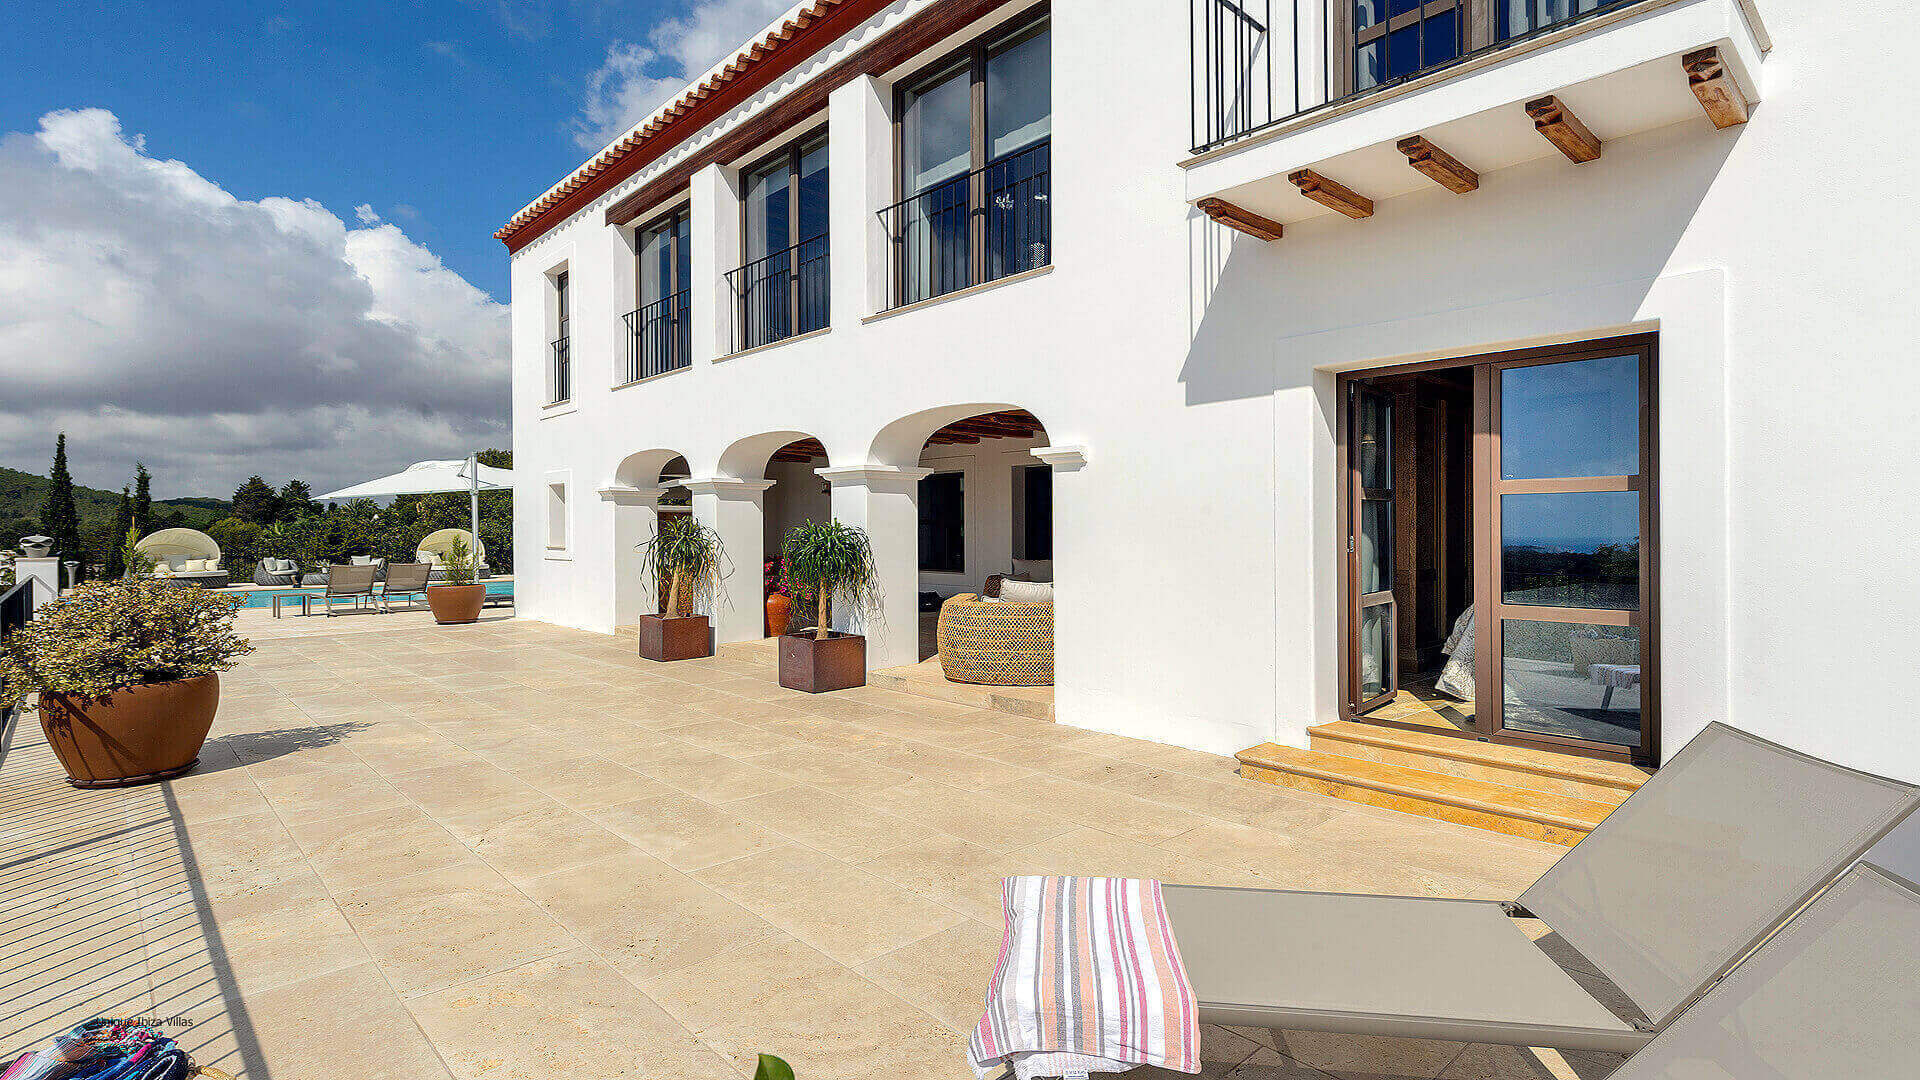 Casa Prats Ibiza 19 Santa Eulalia